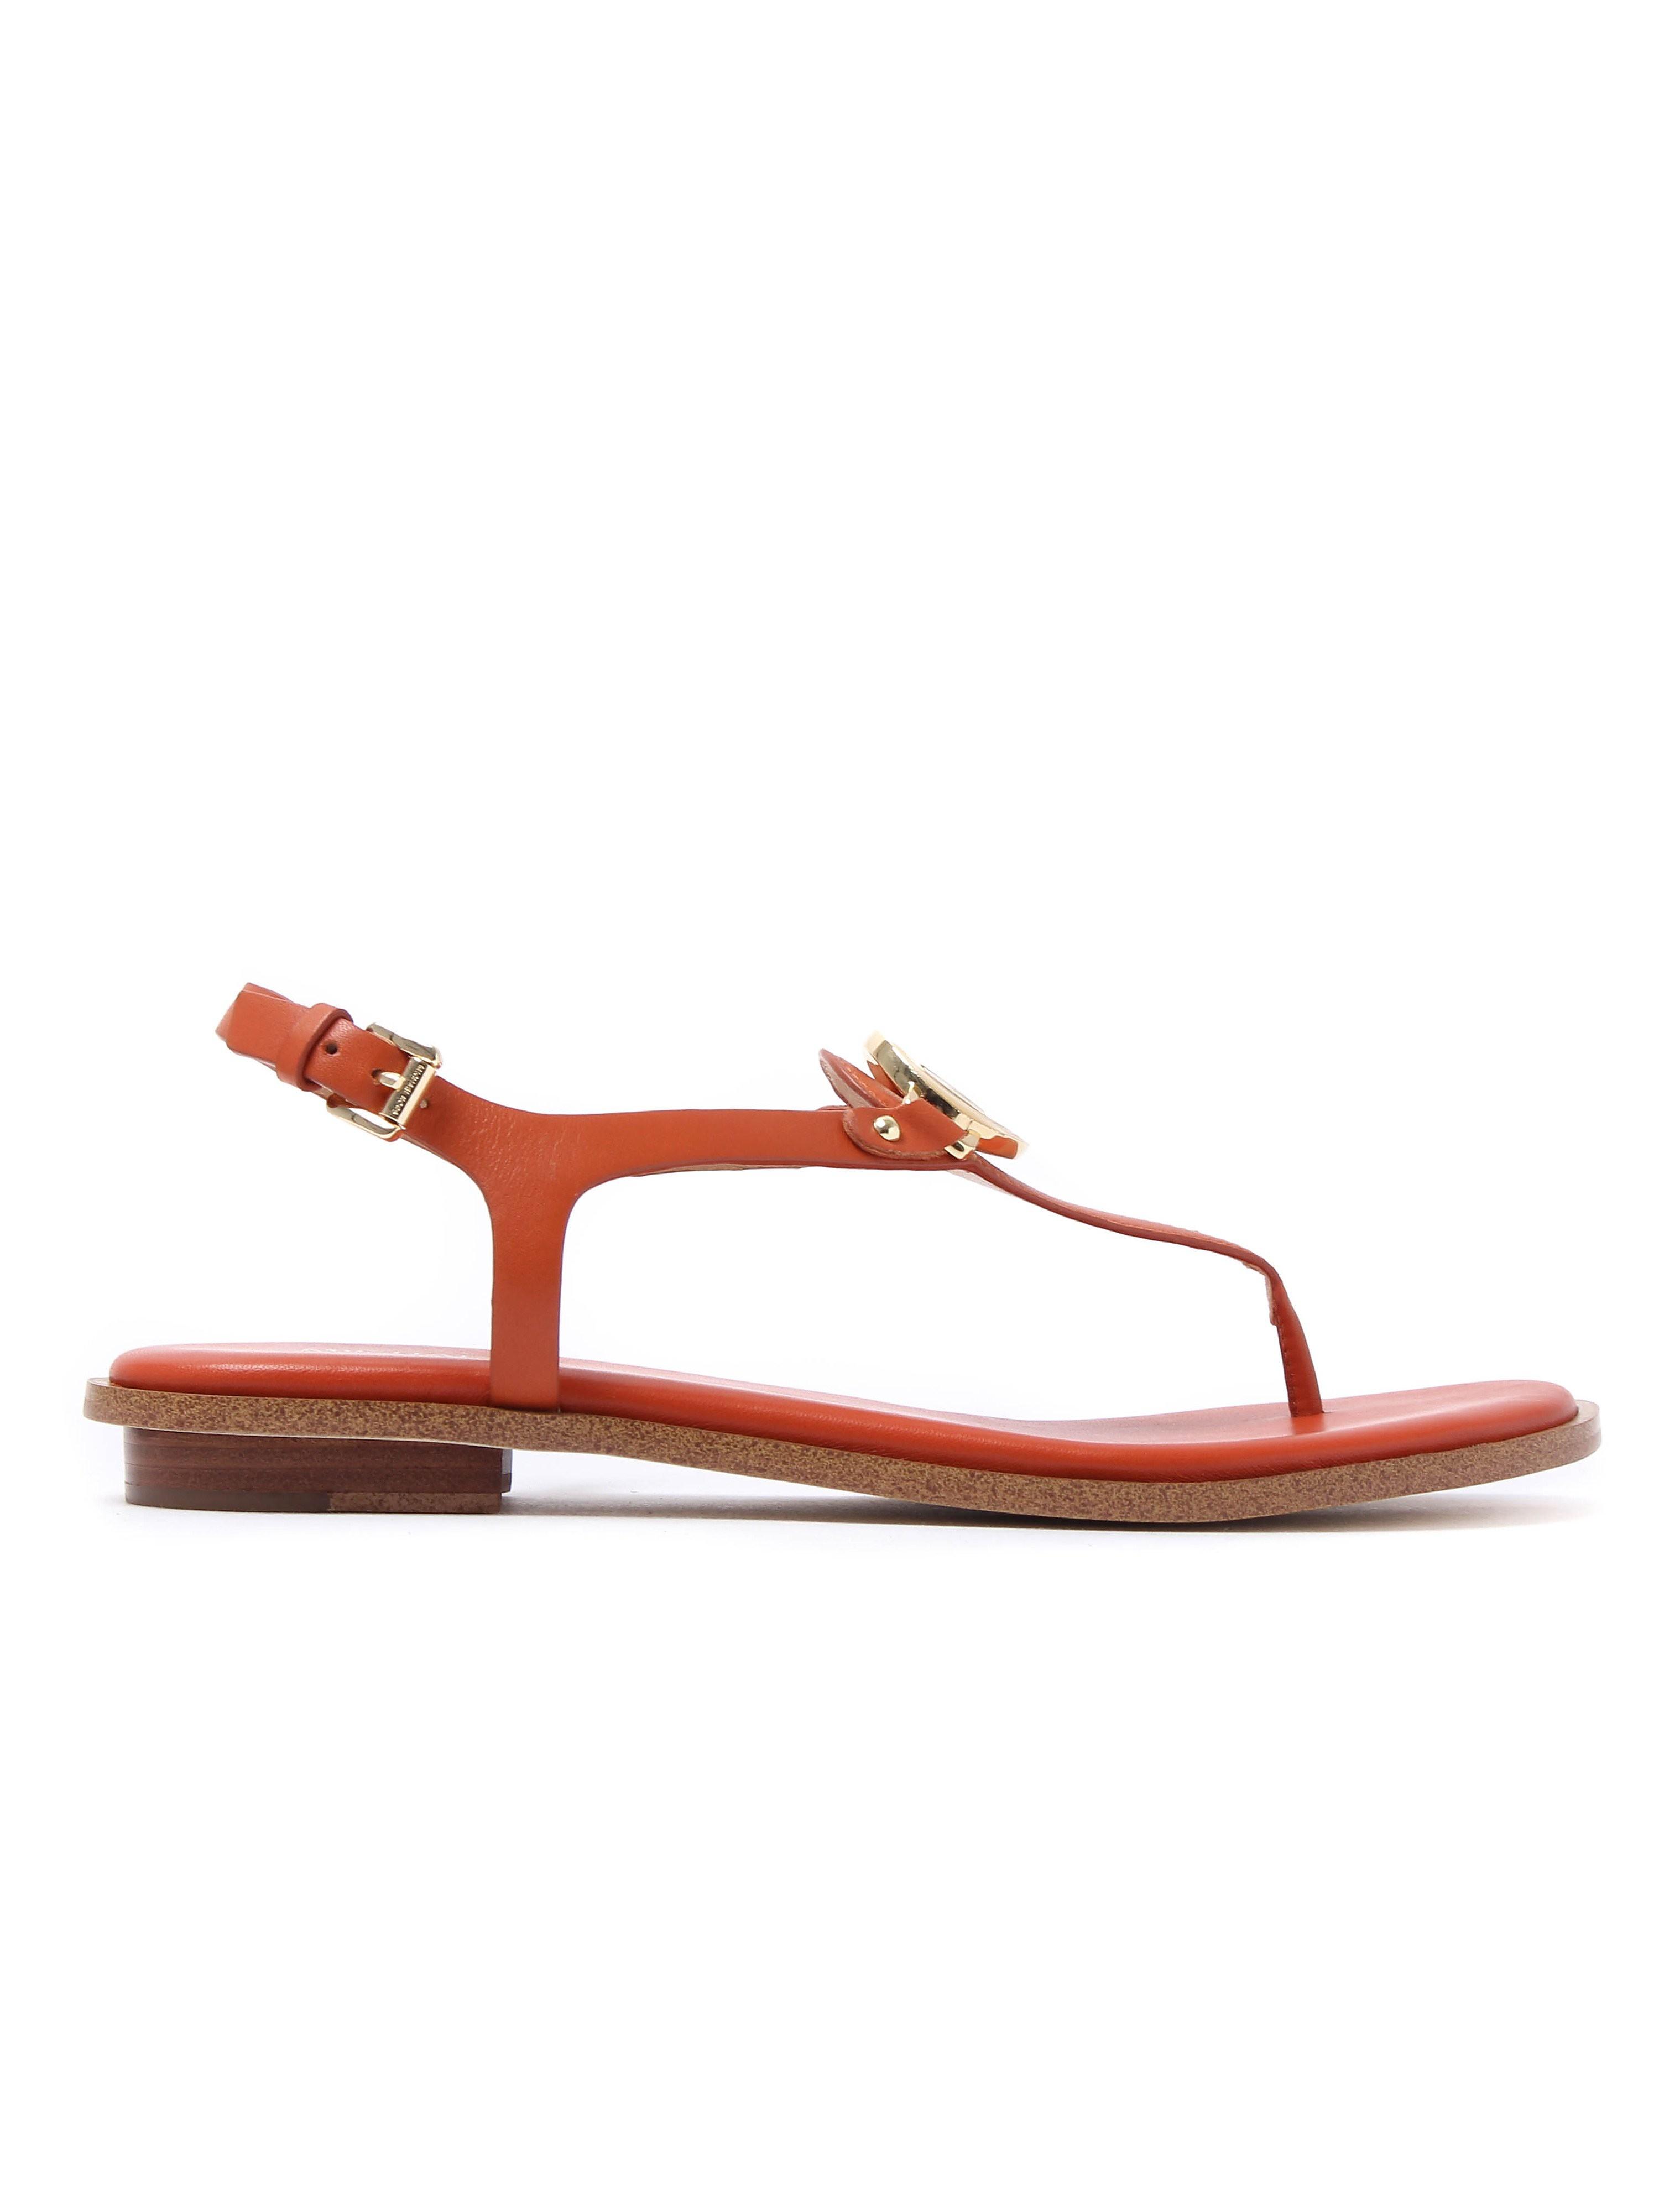 MICHAEL Michael Kors Women's Lee Thong Leather Sandals - Orange